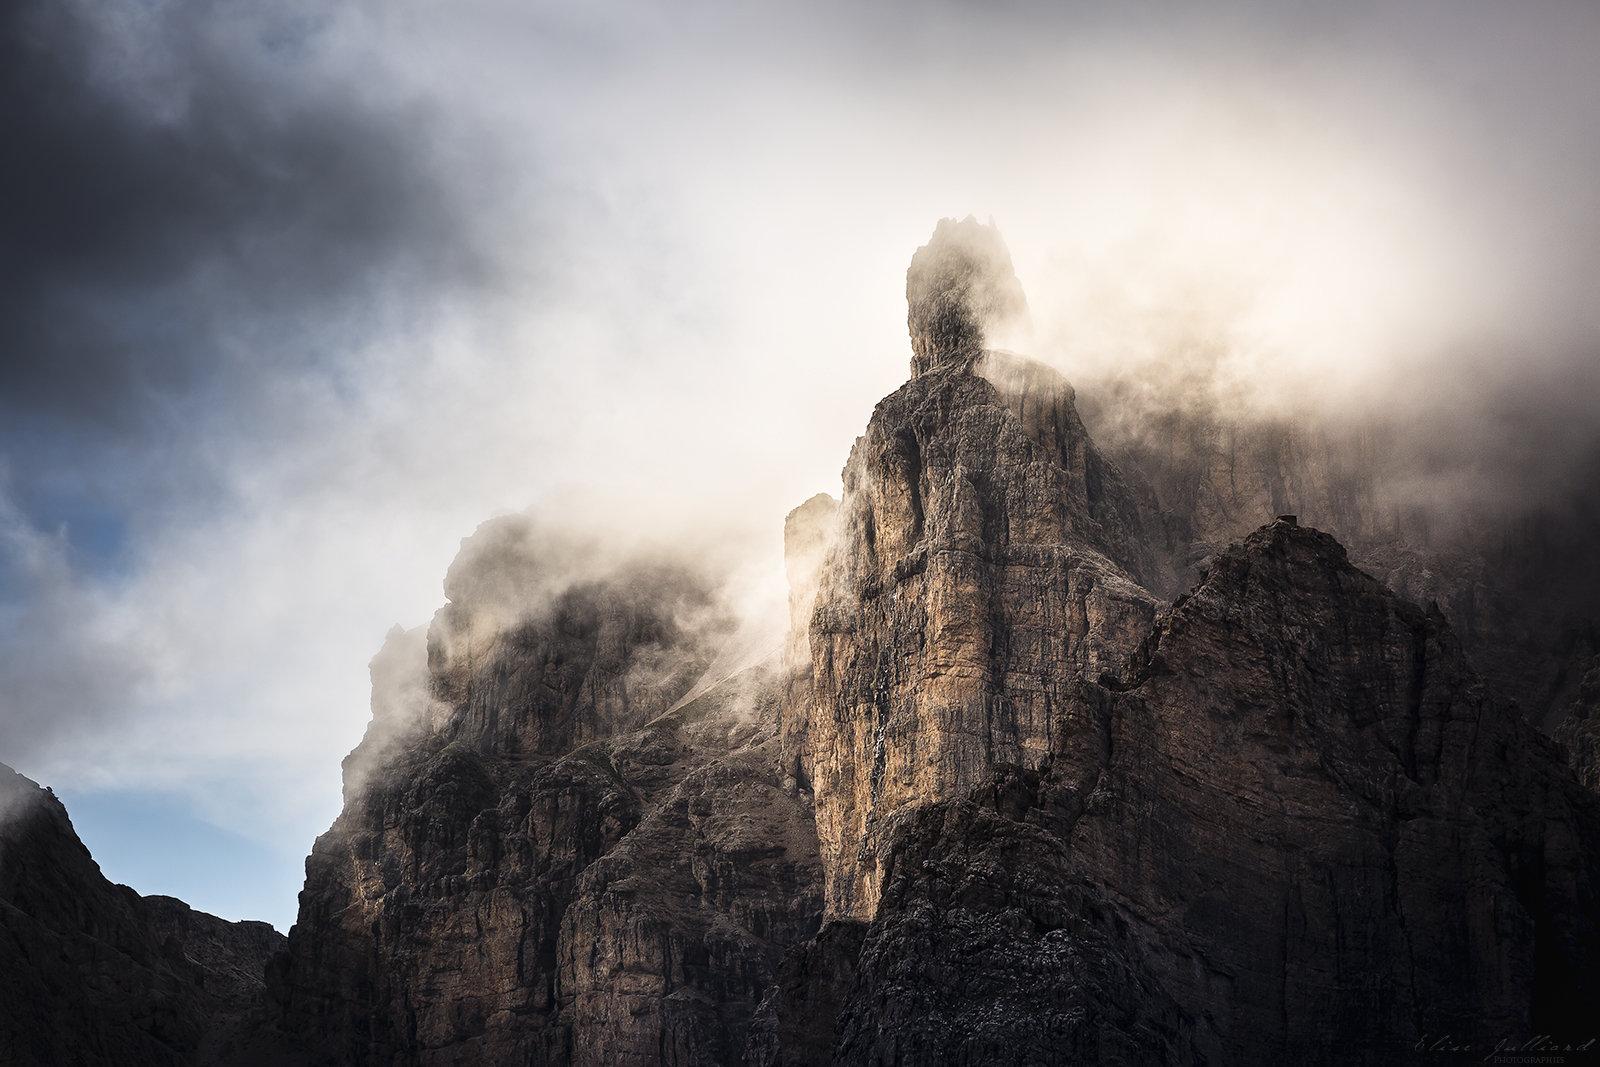 elise-julliard-photographe-lyon-france-montagne-dolomites-dolomiti-italie-paysage-tre-cime-di-lavaredo-2